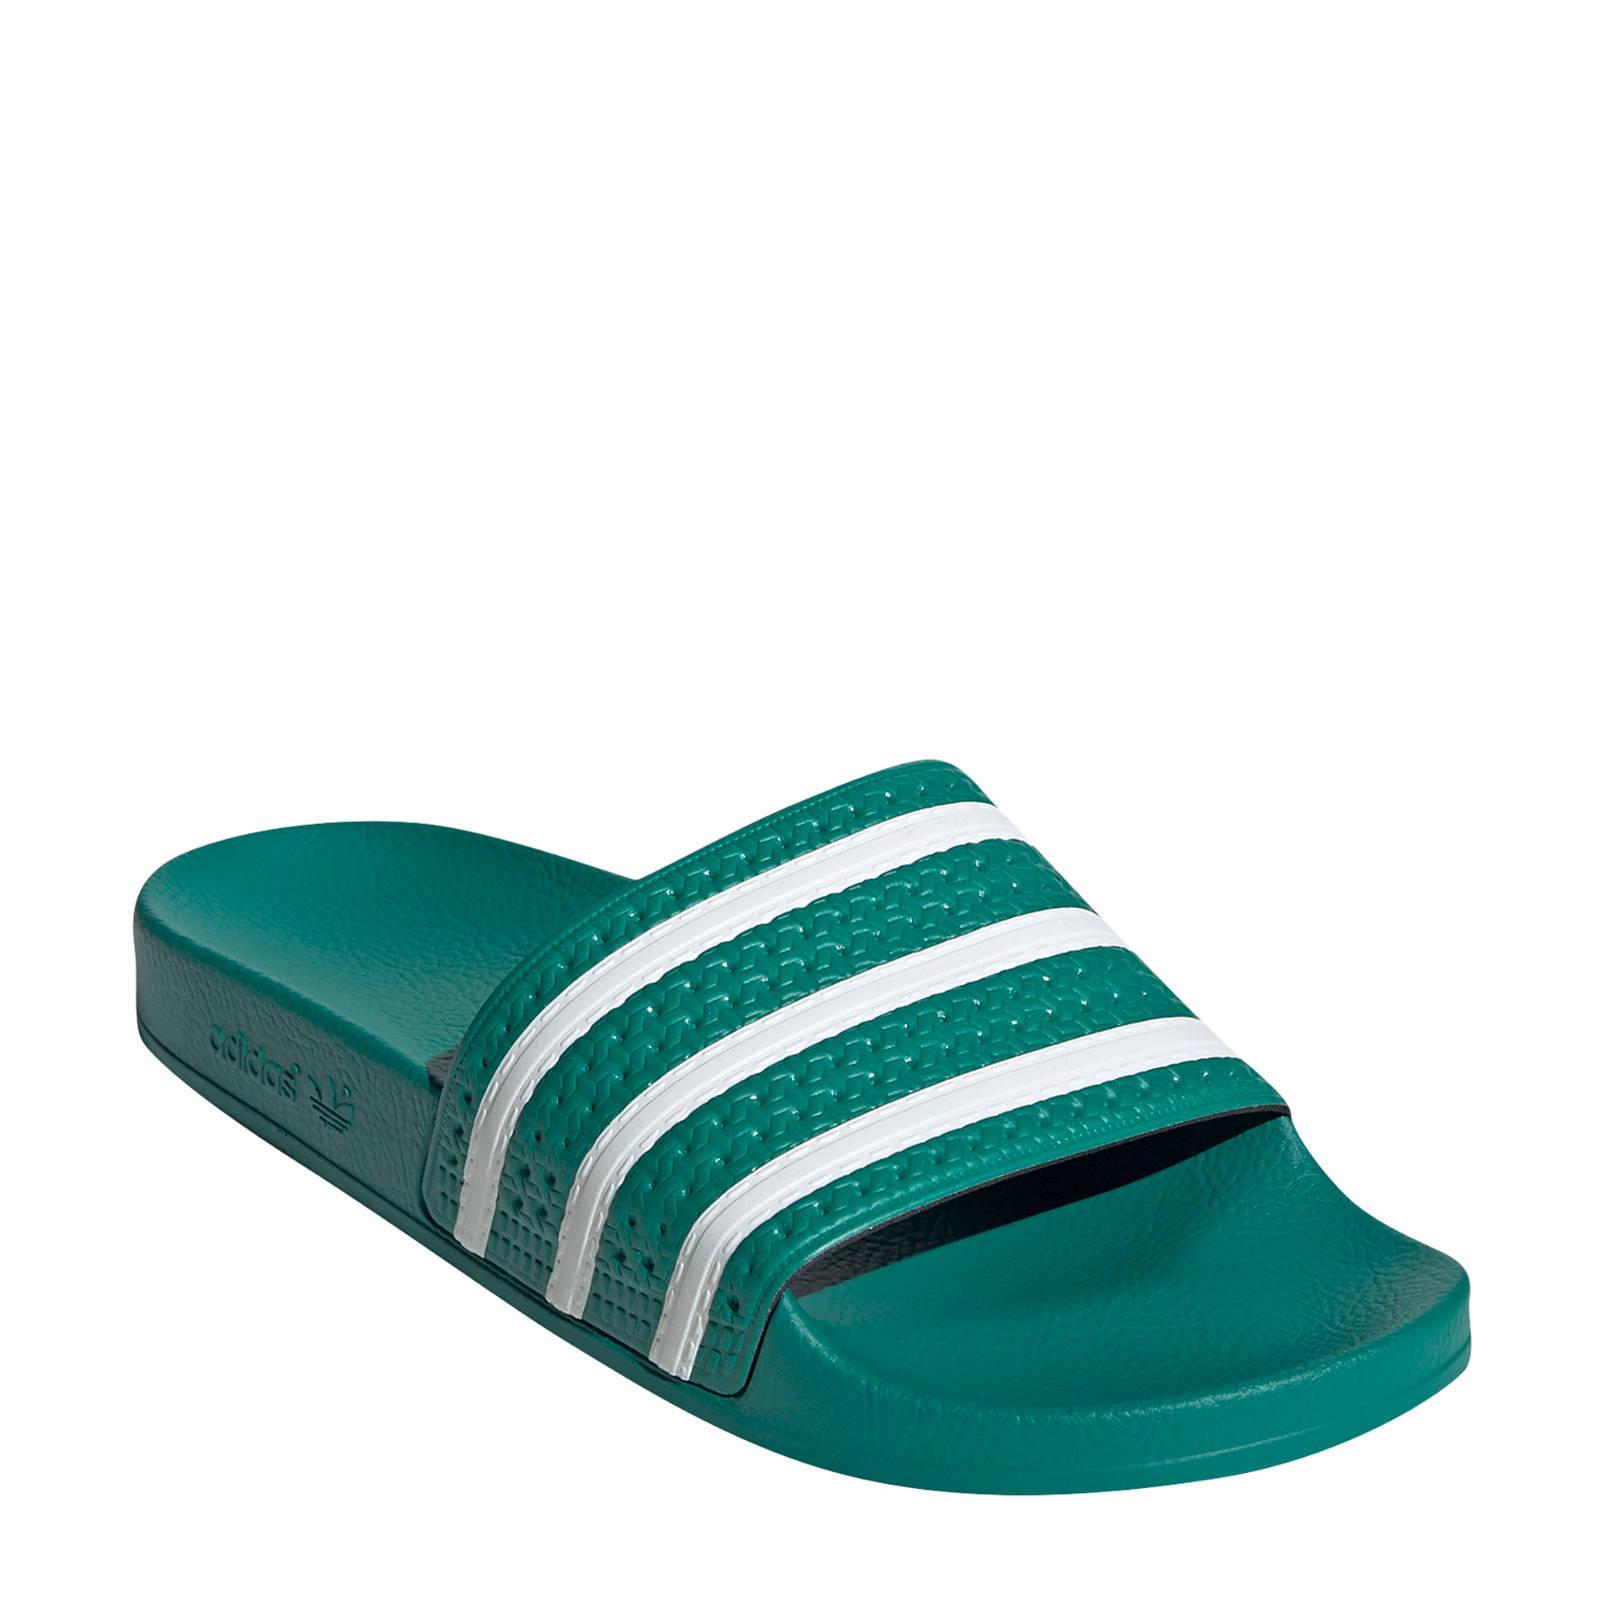 adidas Originals Adilette badslippers groen/wit | wehkamp